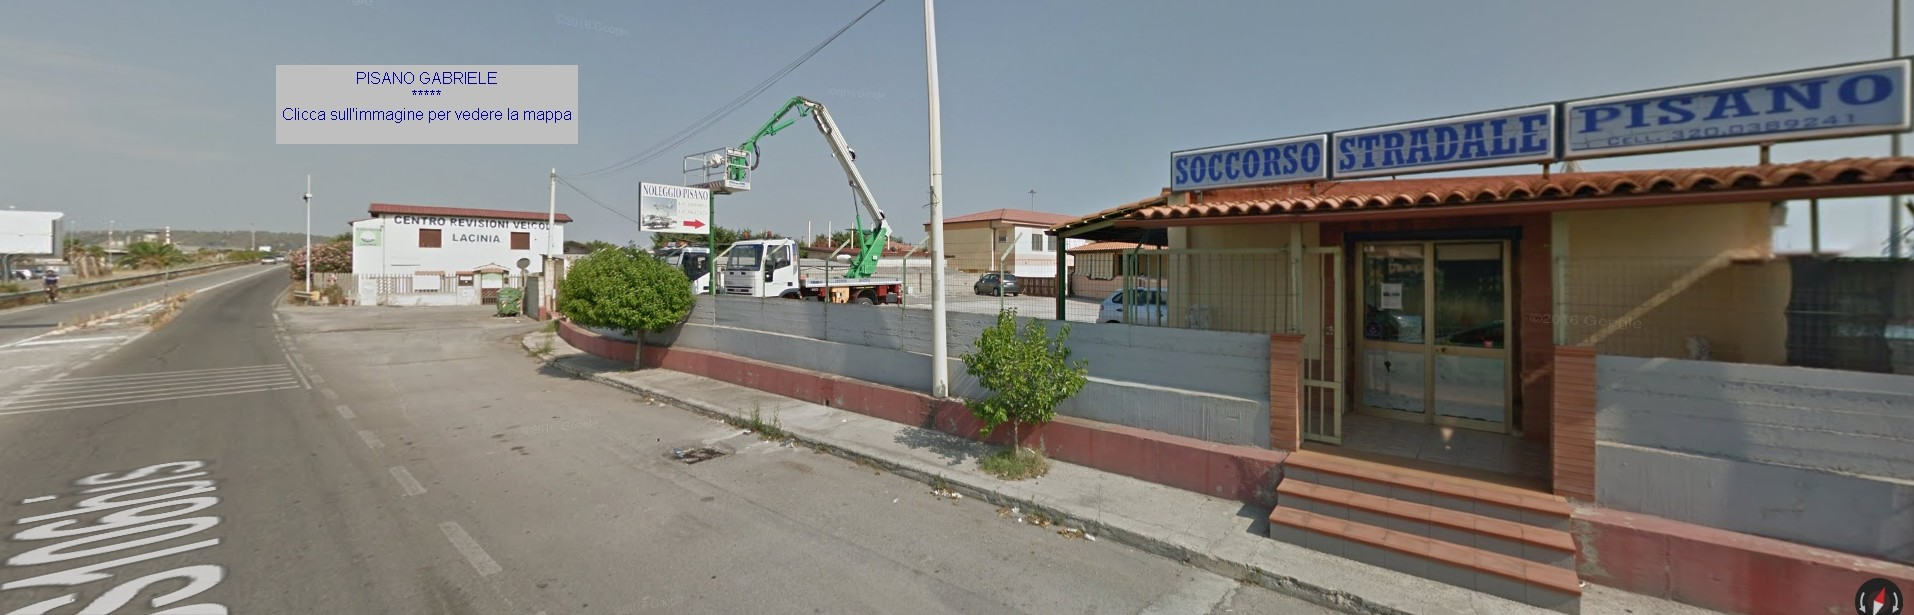 Soccorso stradale Pisano Gabriele, Crotone (KR)